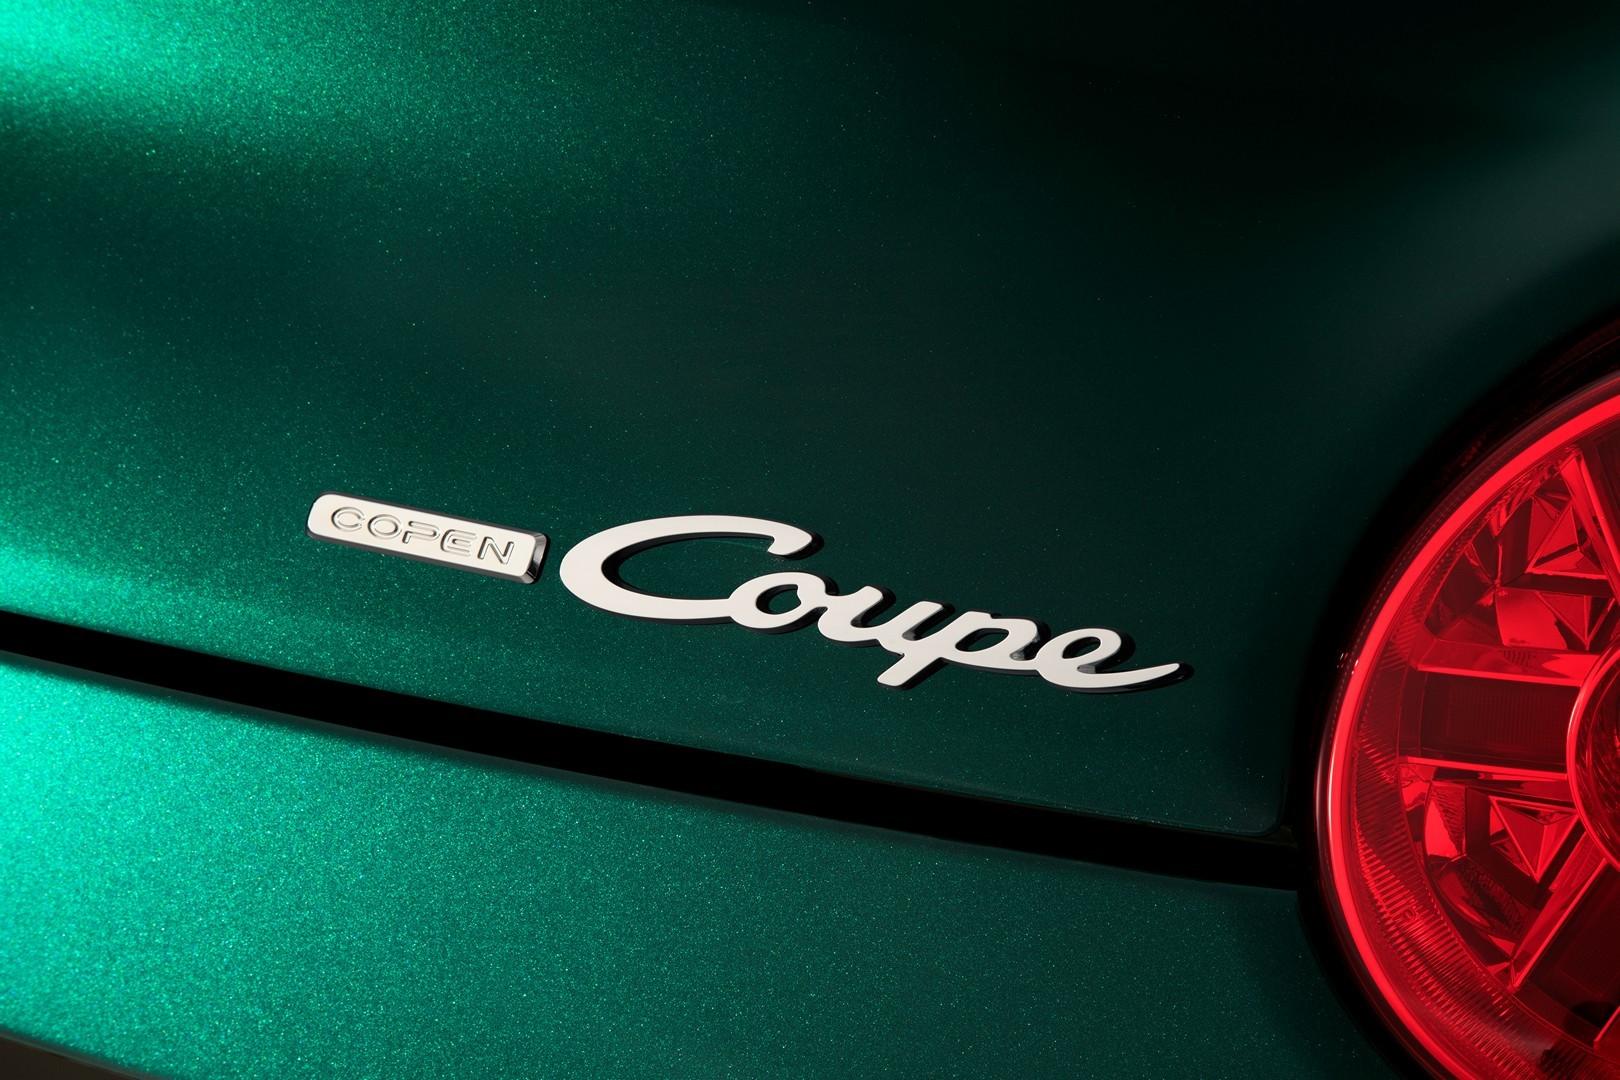 2019 Daihatsu Copen Coupe (5)